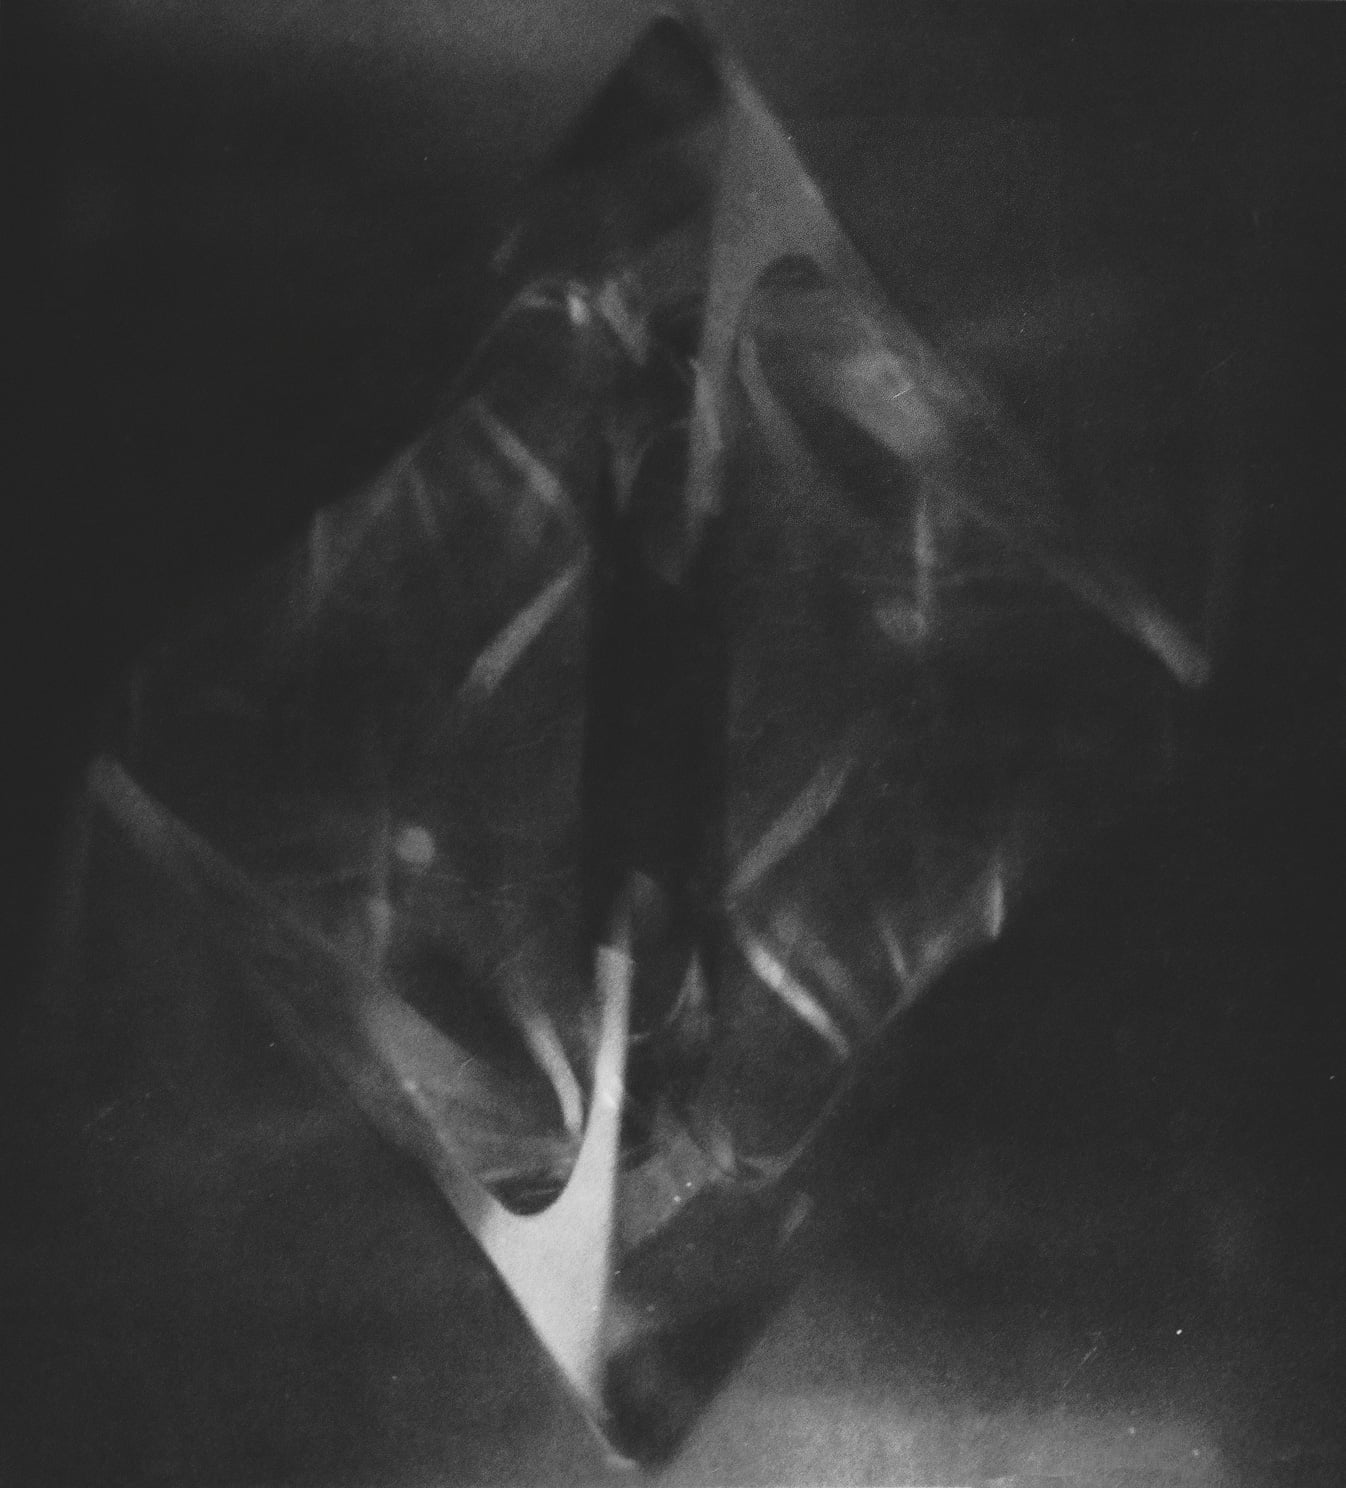 Johanna Daab | Das Phantom, 2016 | 22 x 26 cm / 75 x 90 cm, Silbergelatineabzug